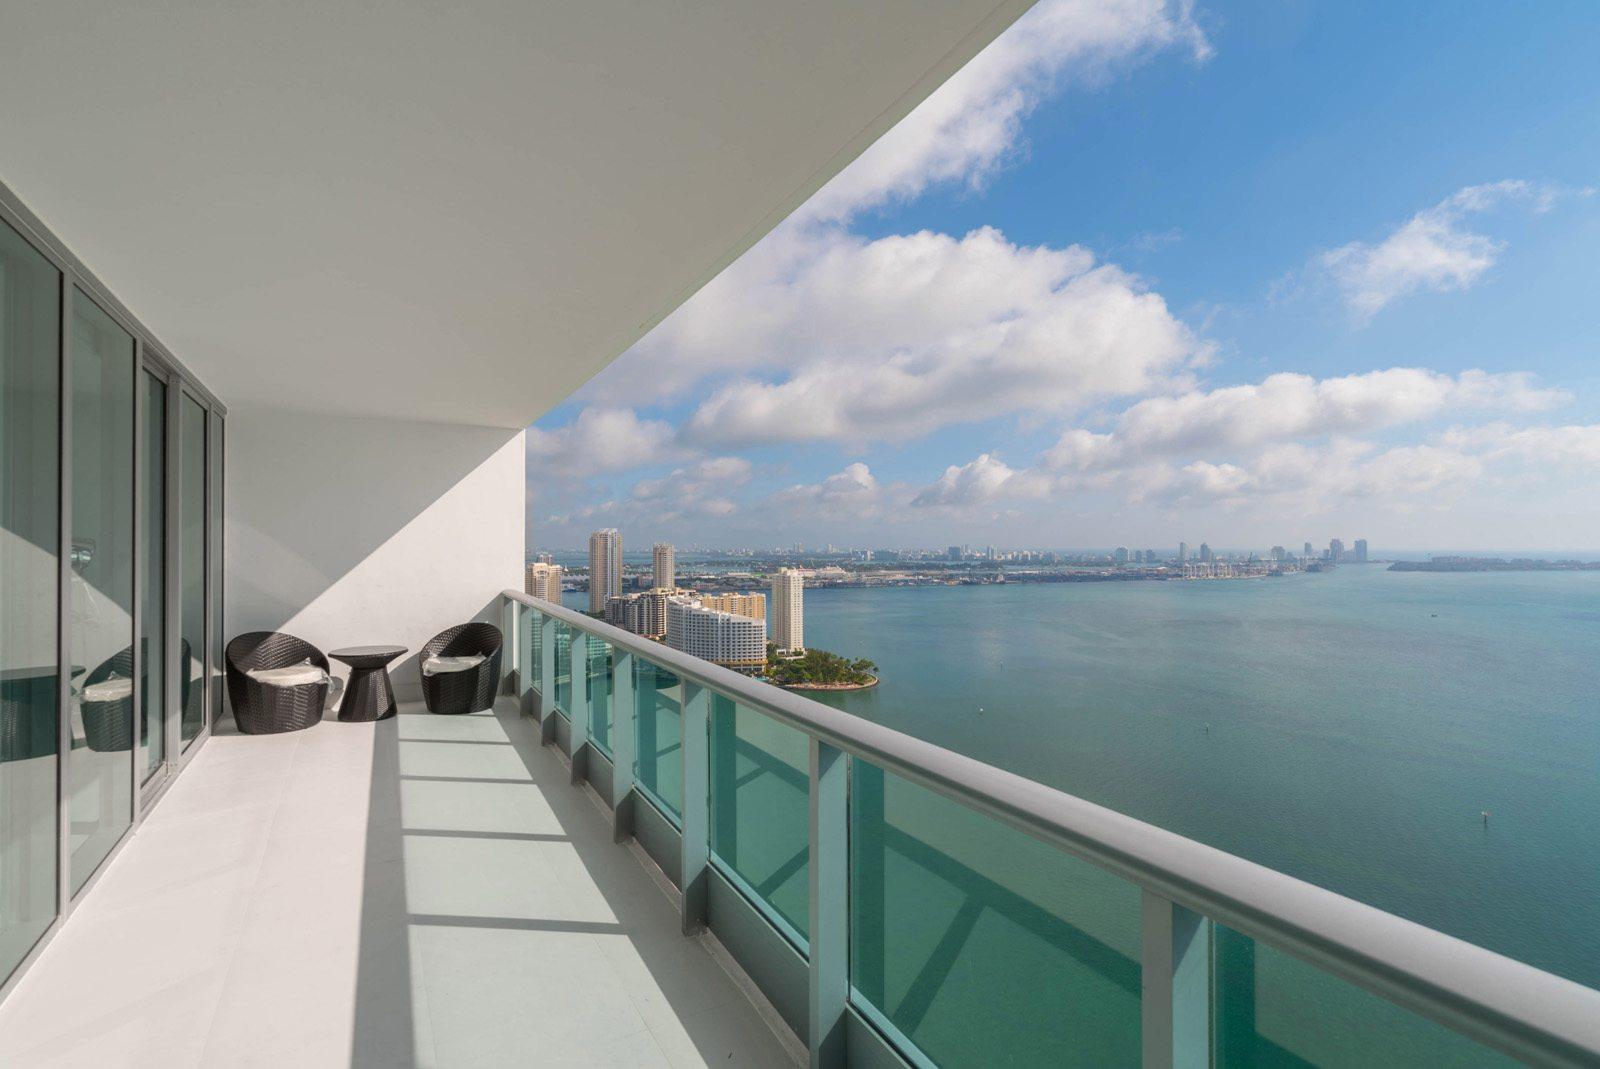 Jade at Brickell Bay view from 41st floor